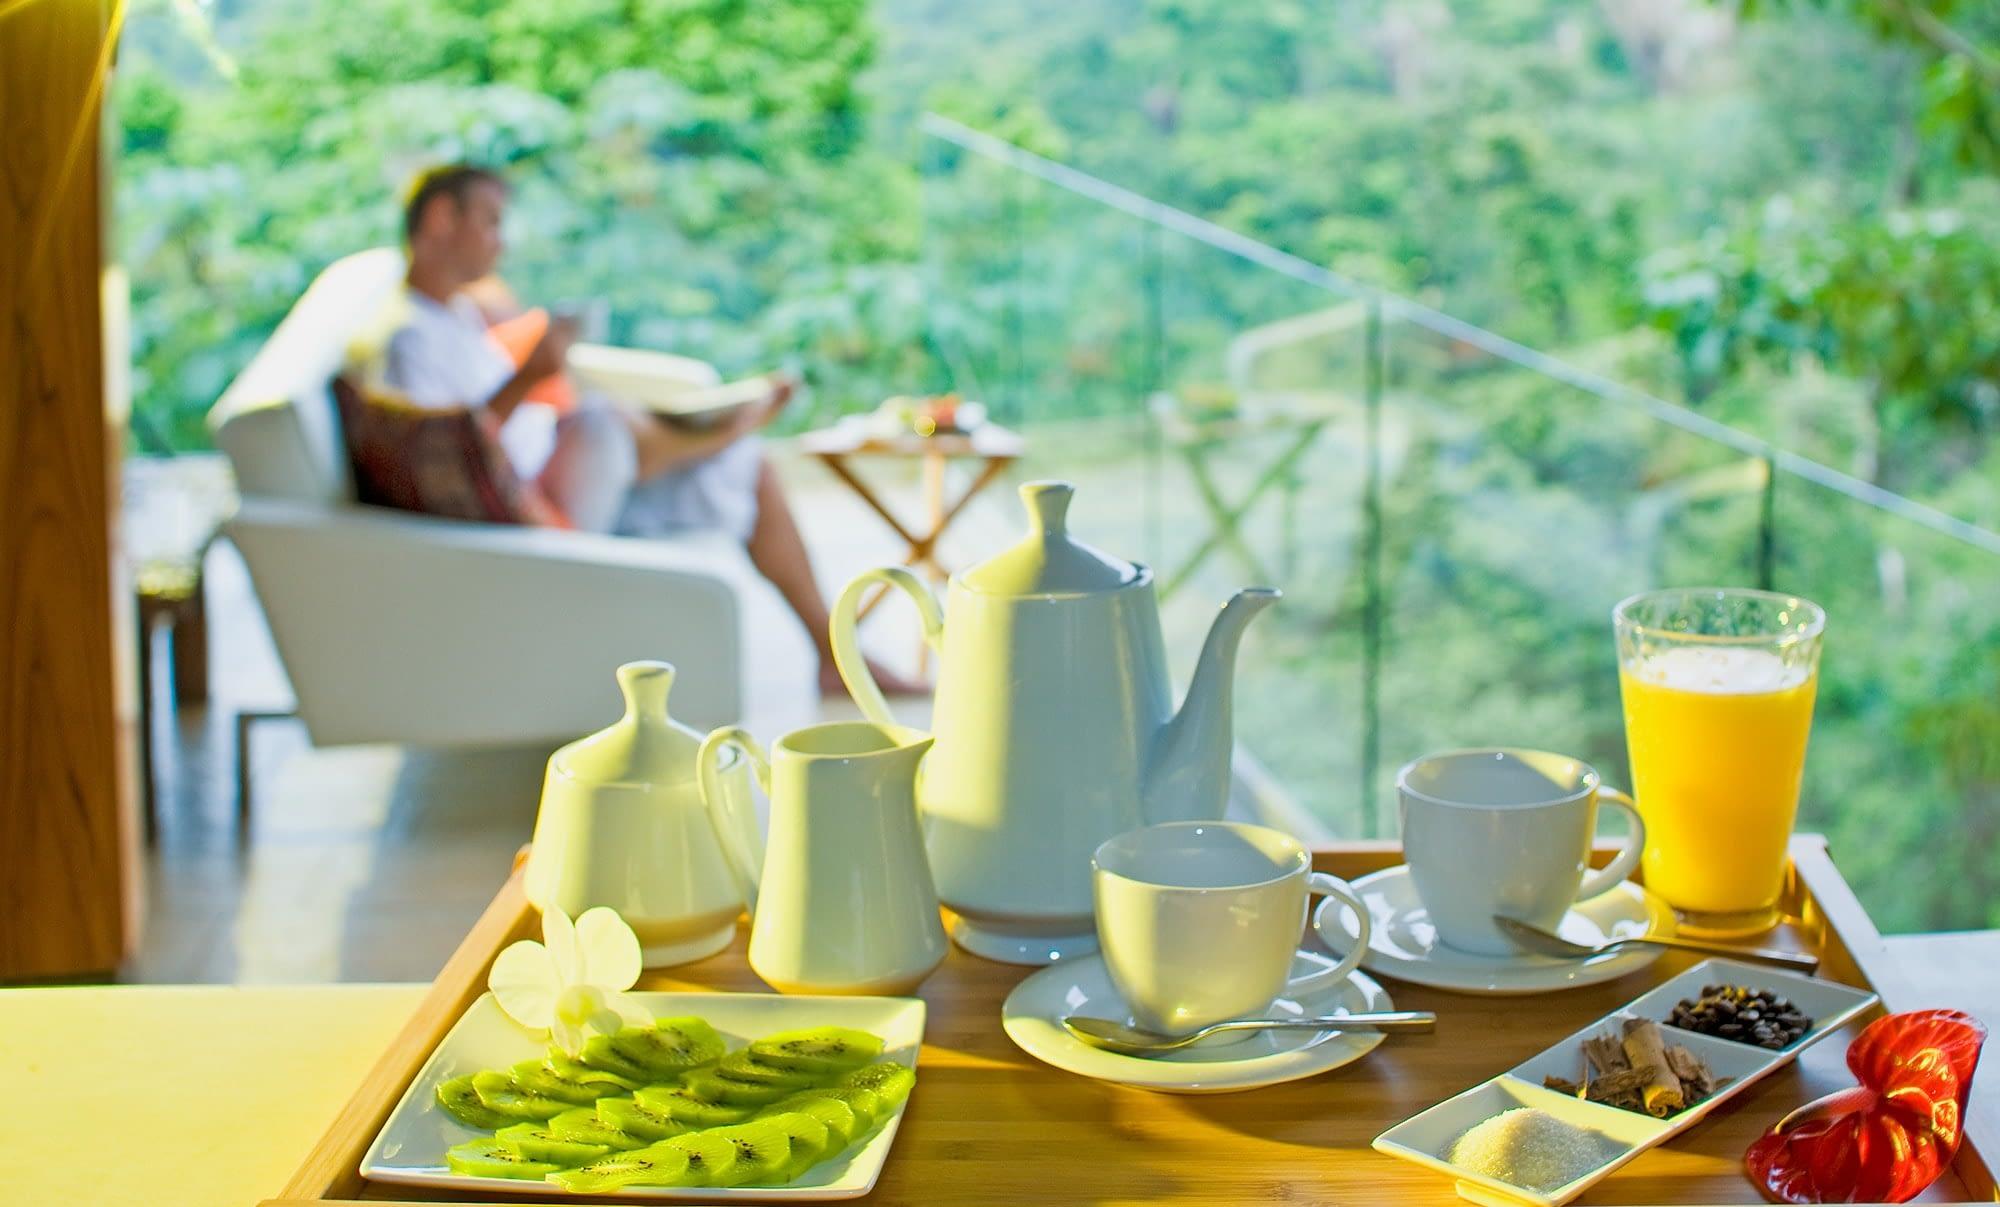 complimentary breakfast in costa rica villa